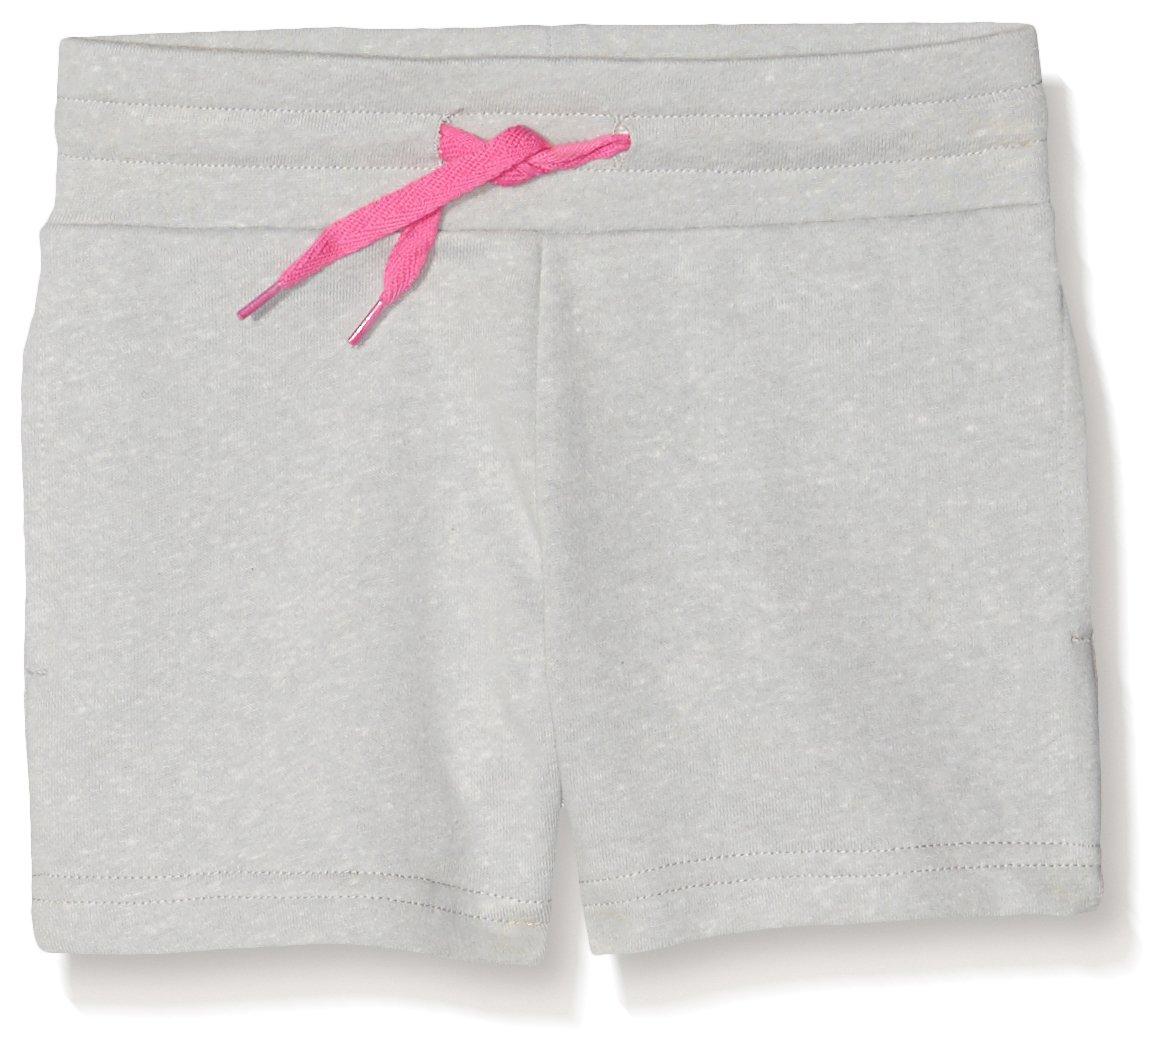 Ben & Lea - Odet, Shorts Bambina 11906